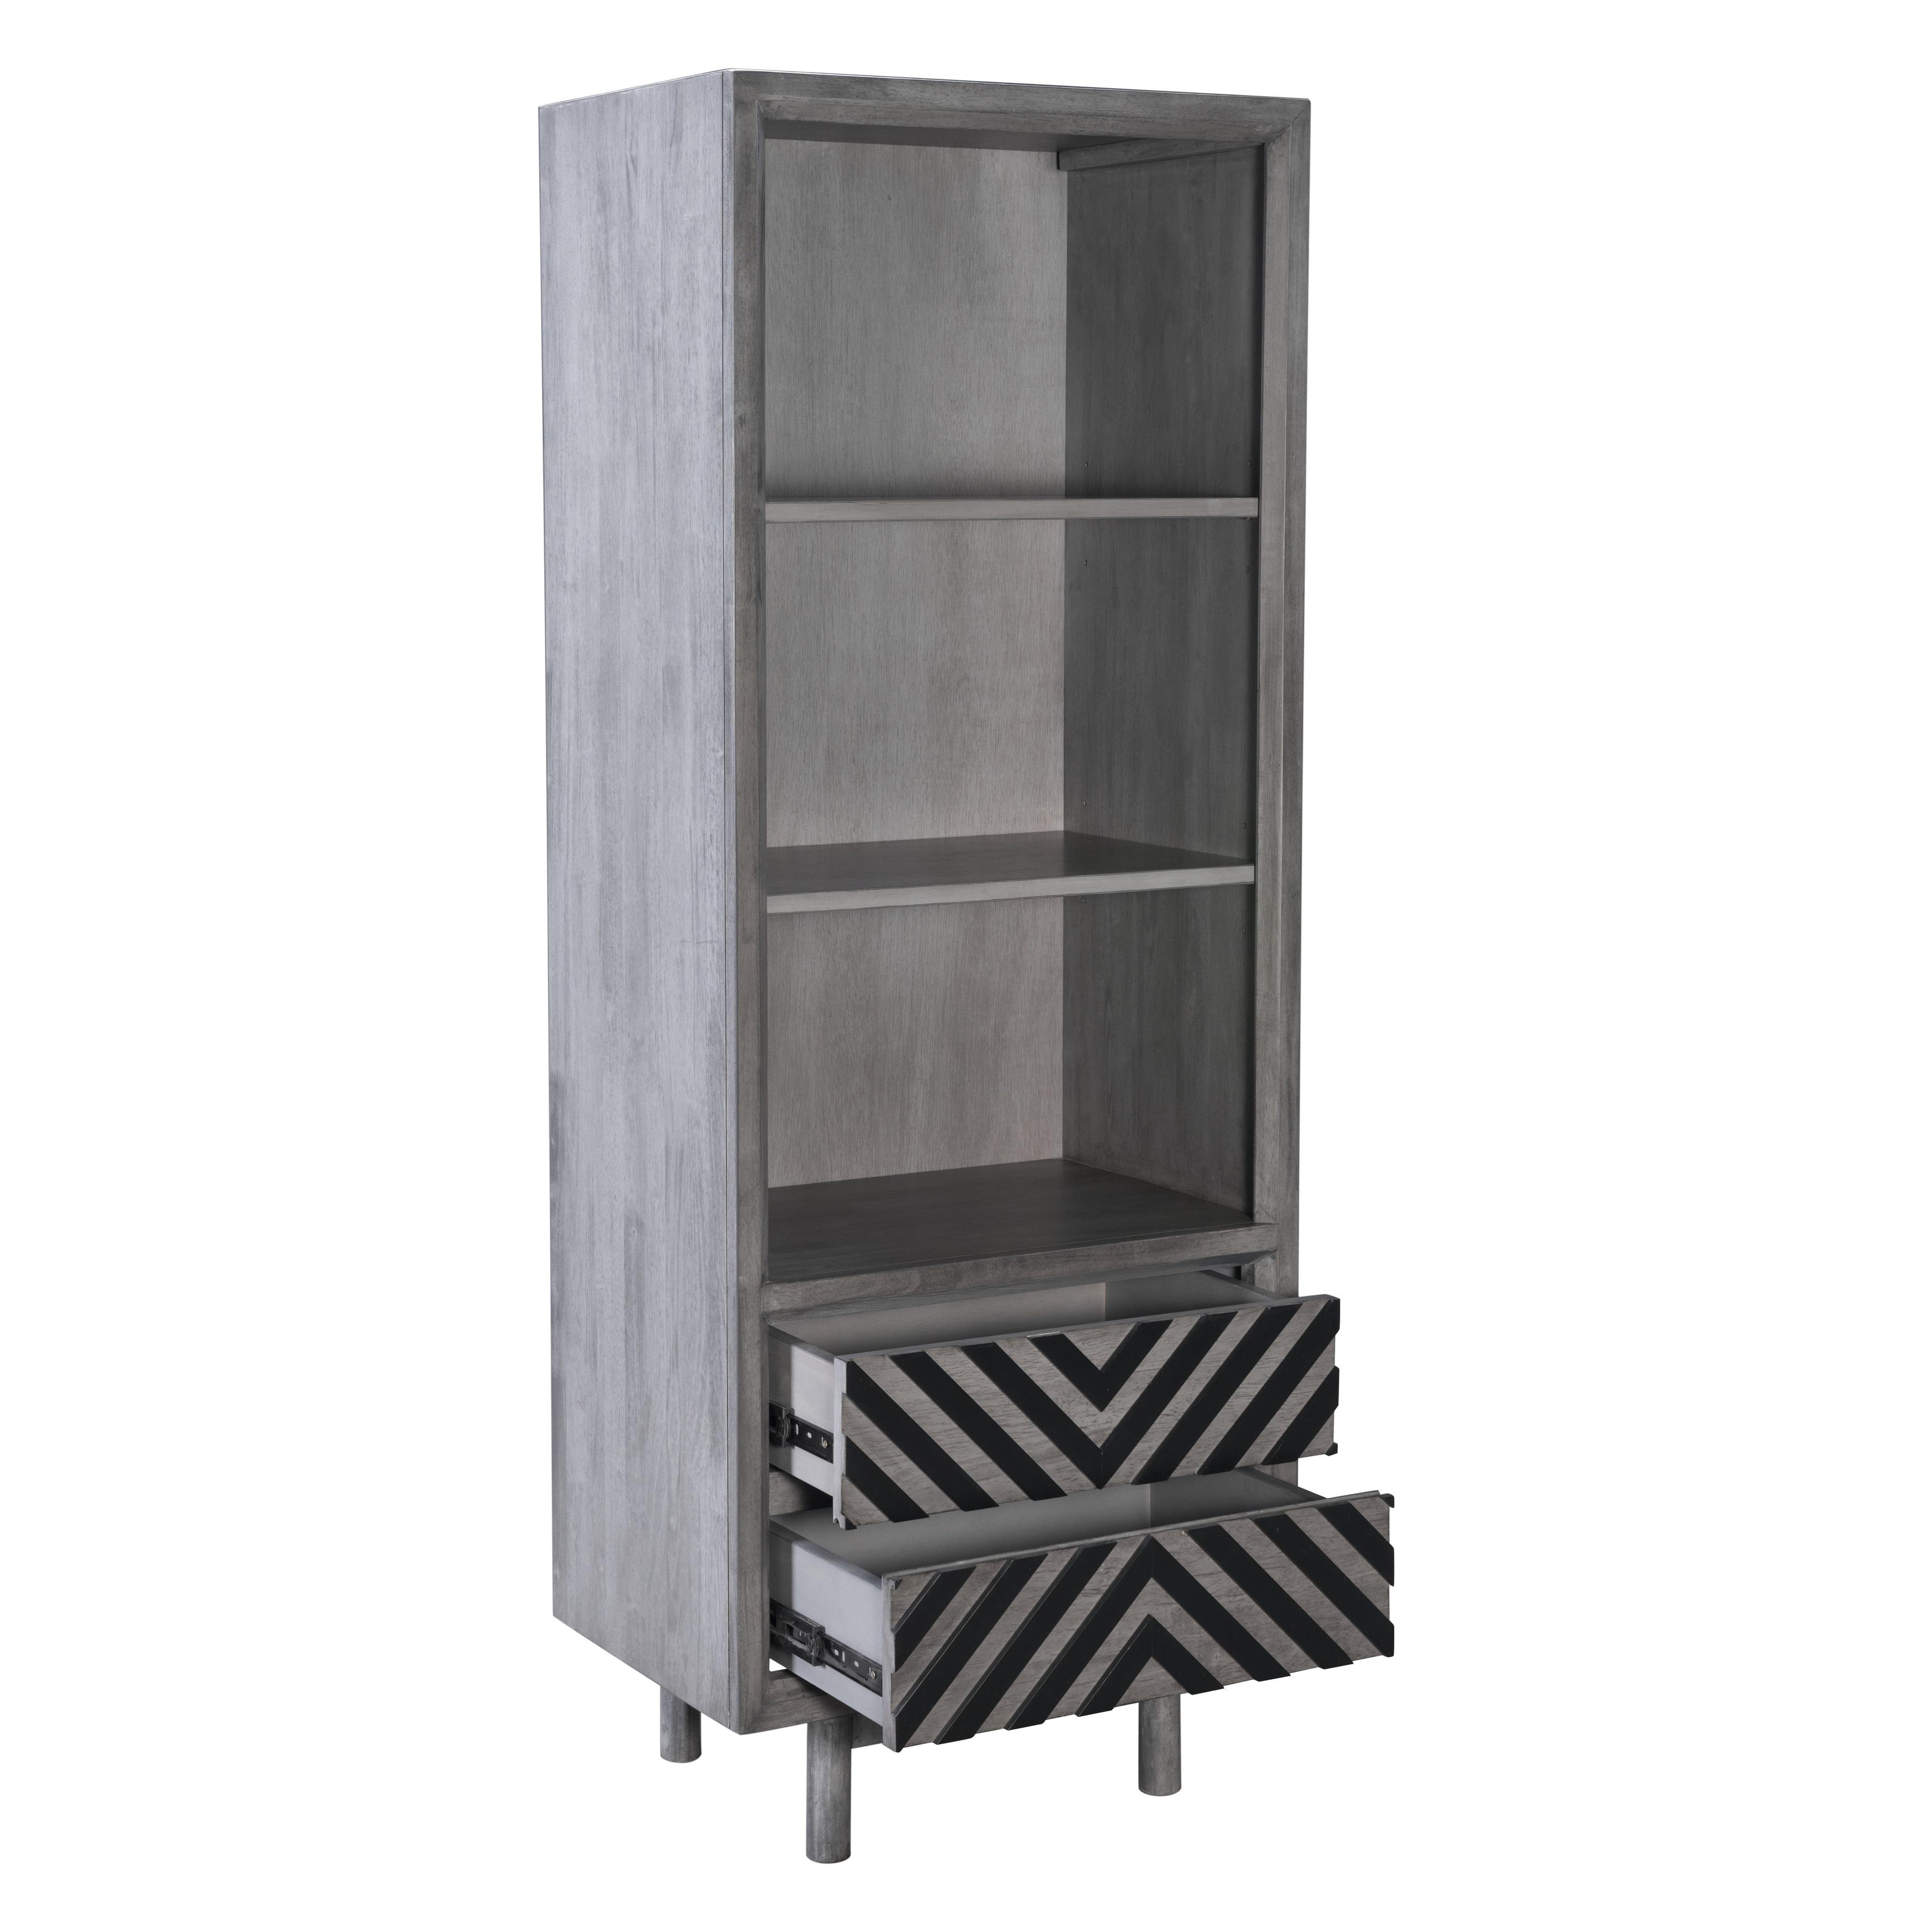 Raven Narrow Tall Old Grey Shelf